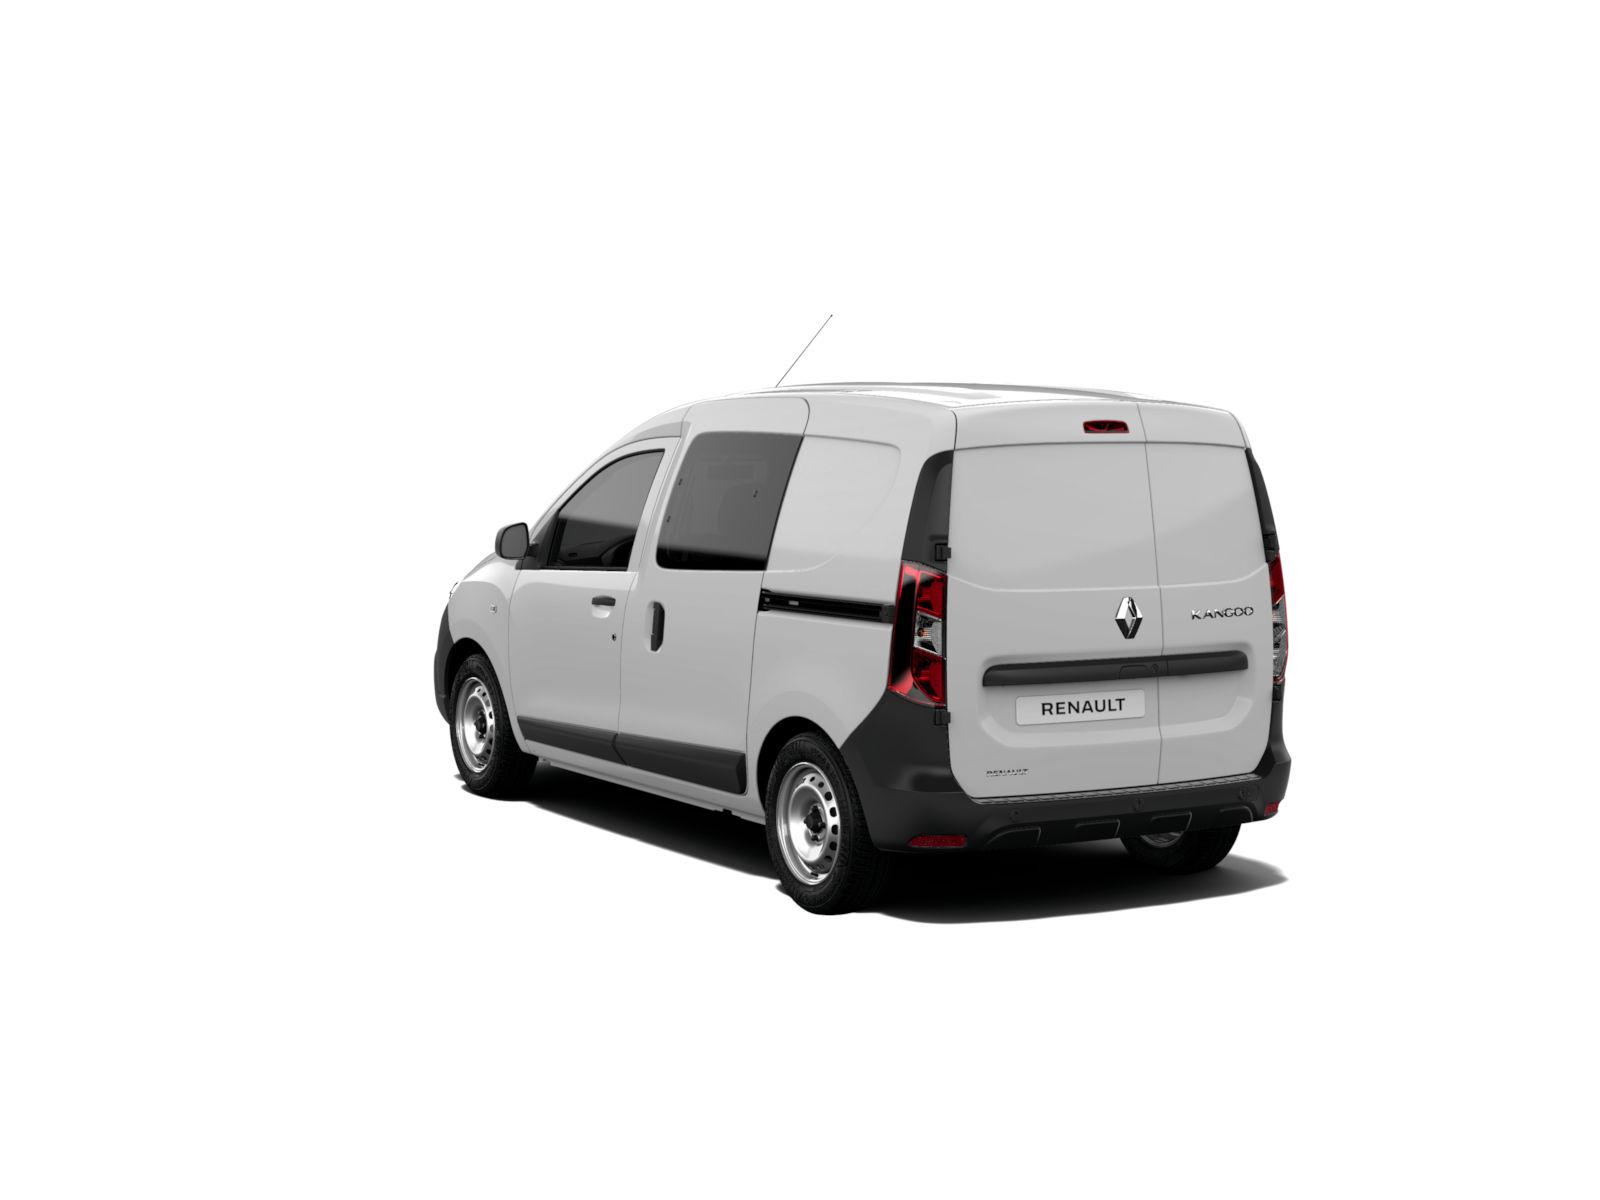 nouveau renault kangoo express 7 the automobilist. Black Bedroom Furniture Sets. Home Design Ideas